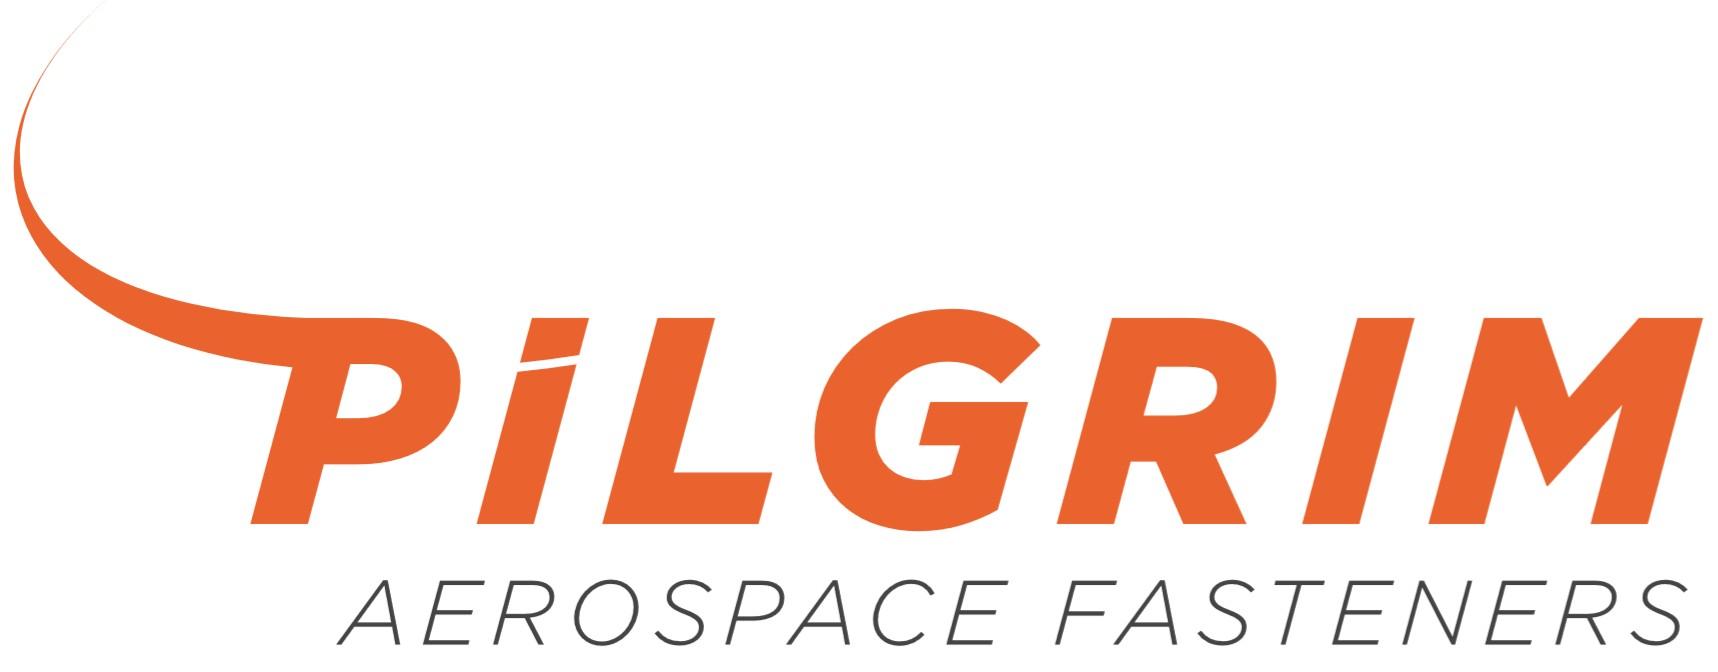 Pilgrim Aerospace Fasteners   LinkedIn